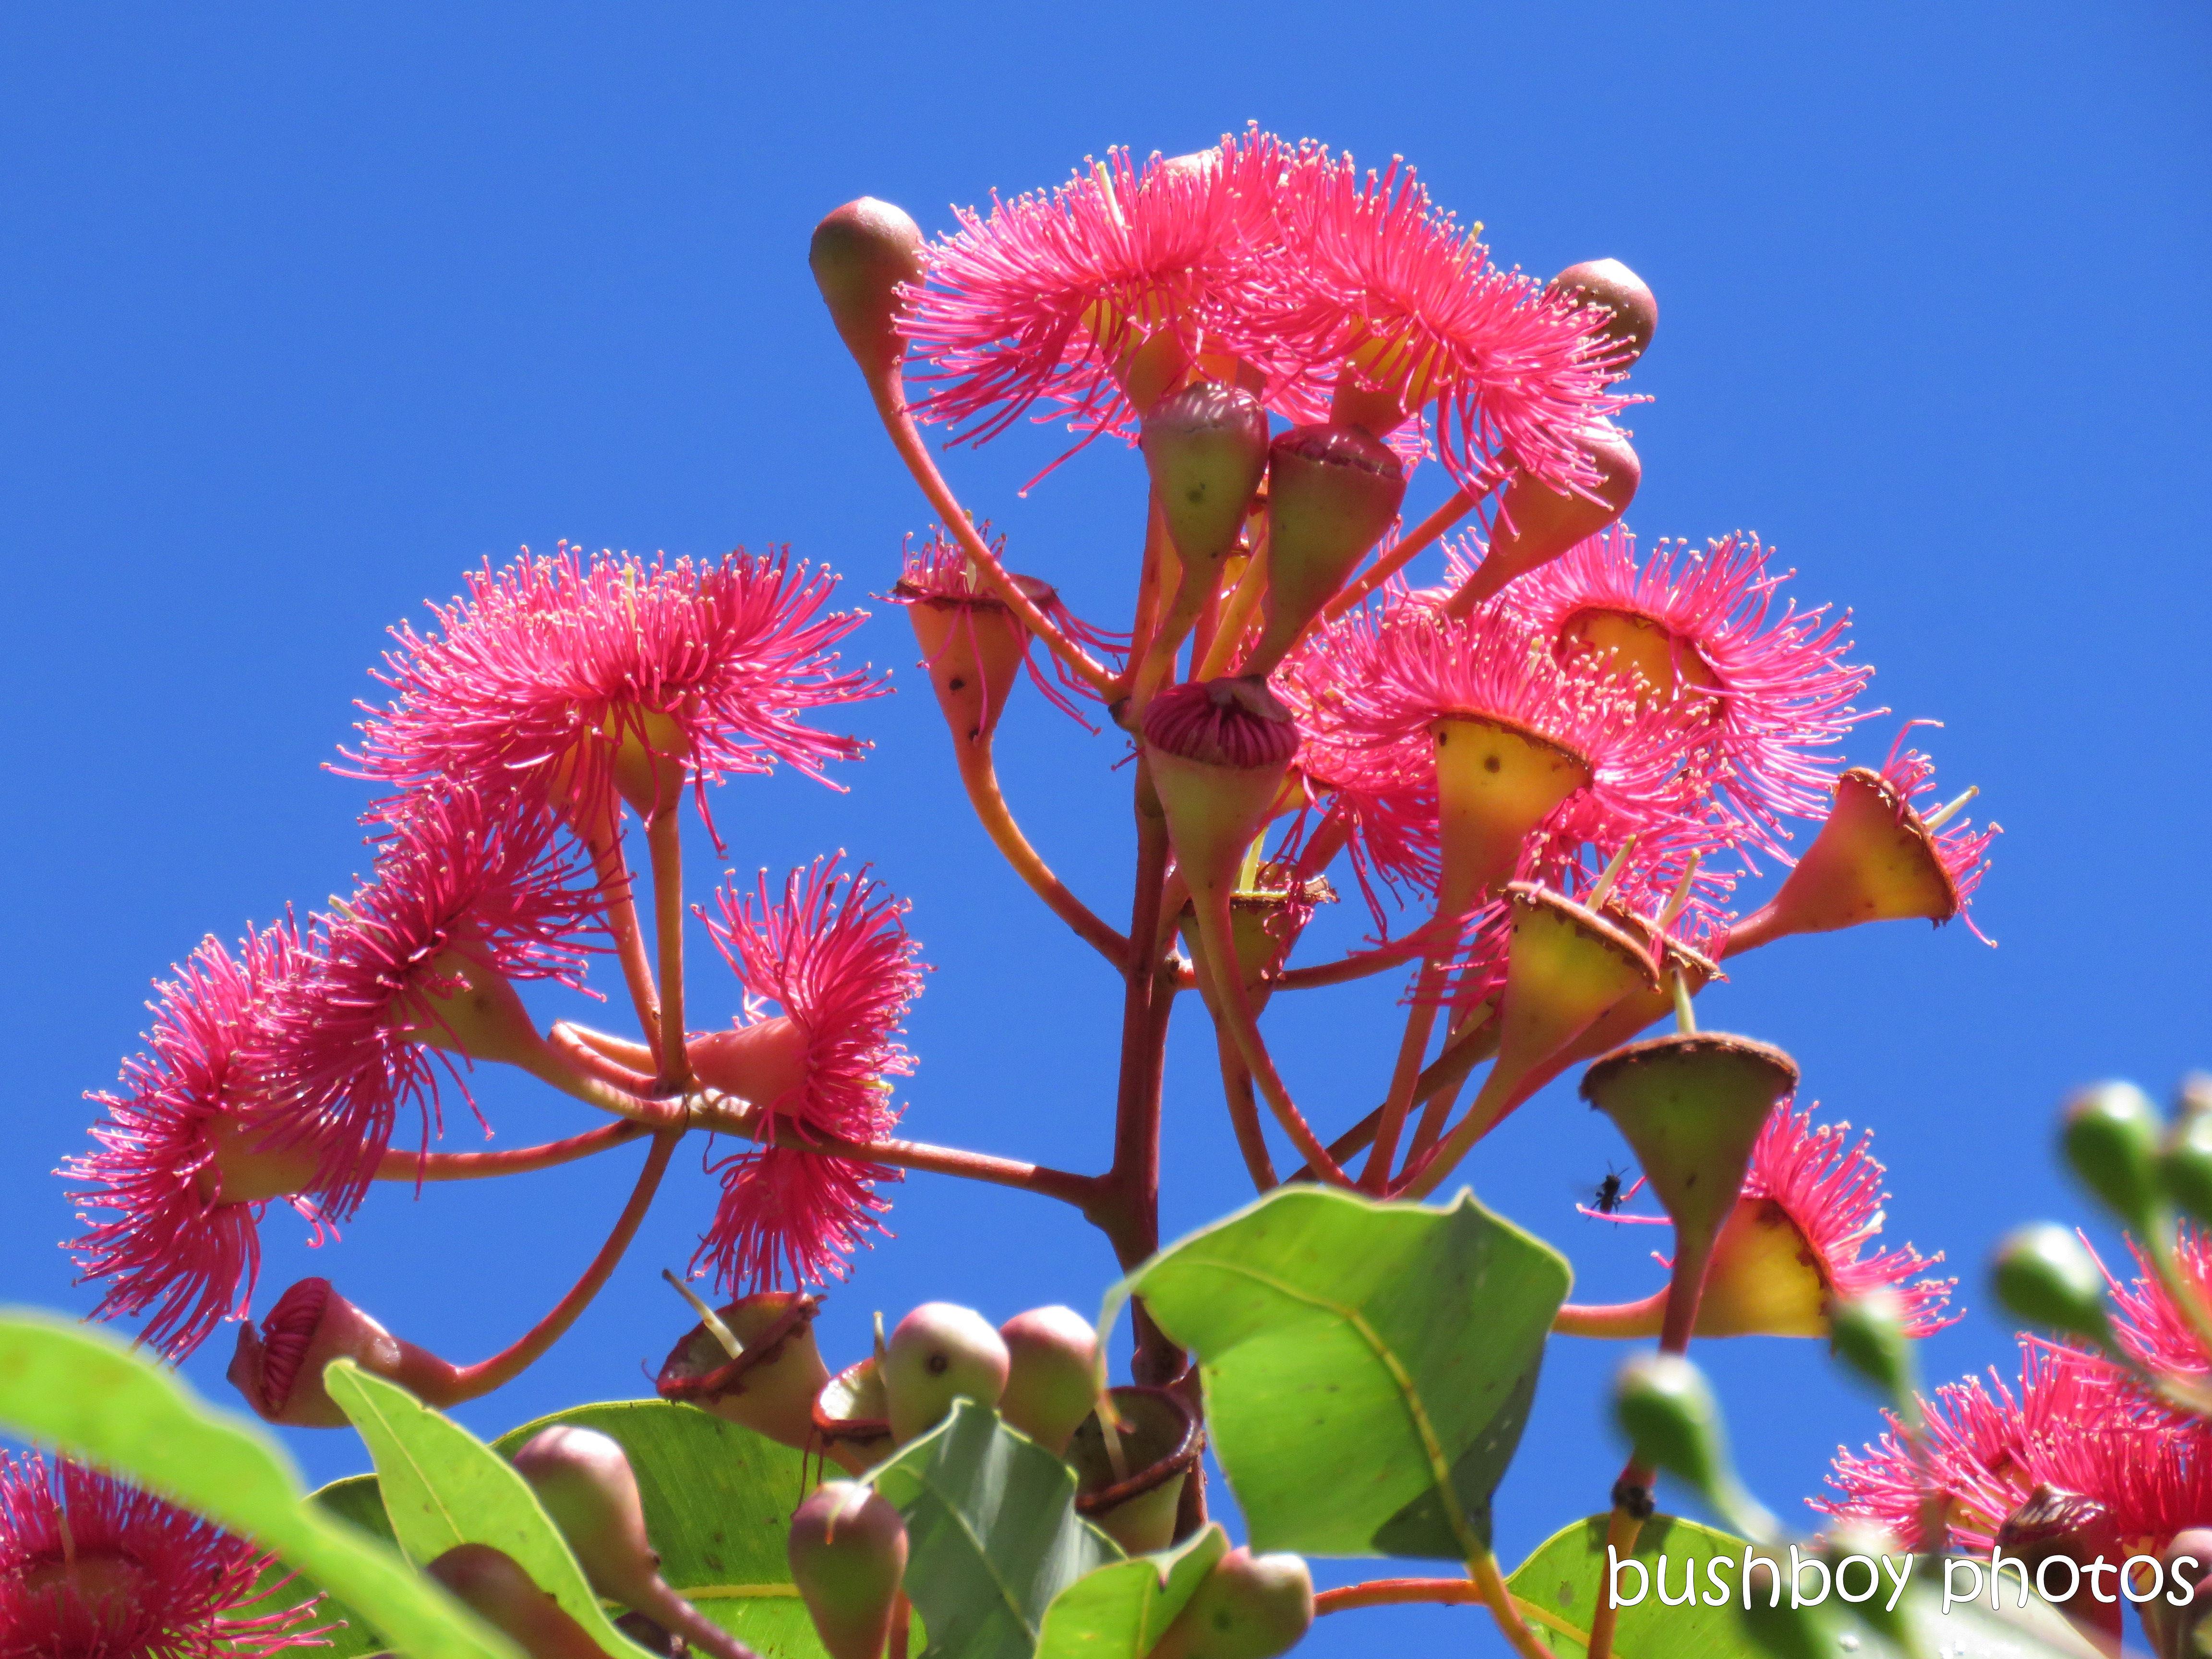 190127_blog_challenge_contrasting_colours_eucalypt_flower_sky